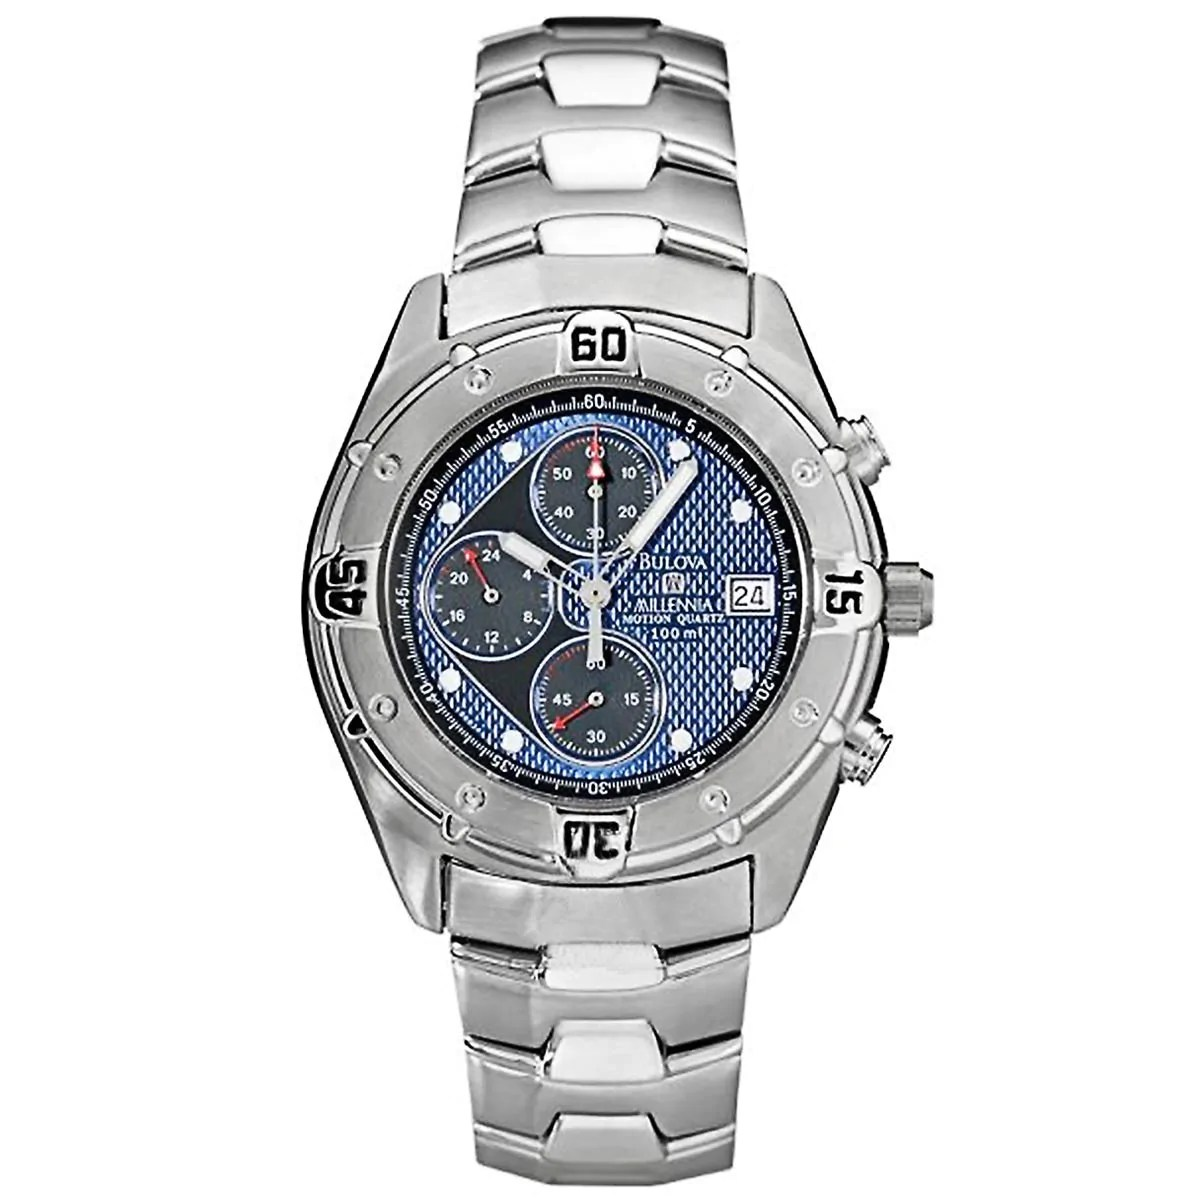 Bulova 96B34 Gent's Blue & Black Dial Chrono Motion Quartz Watch